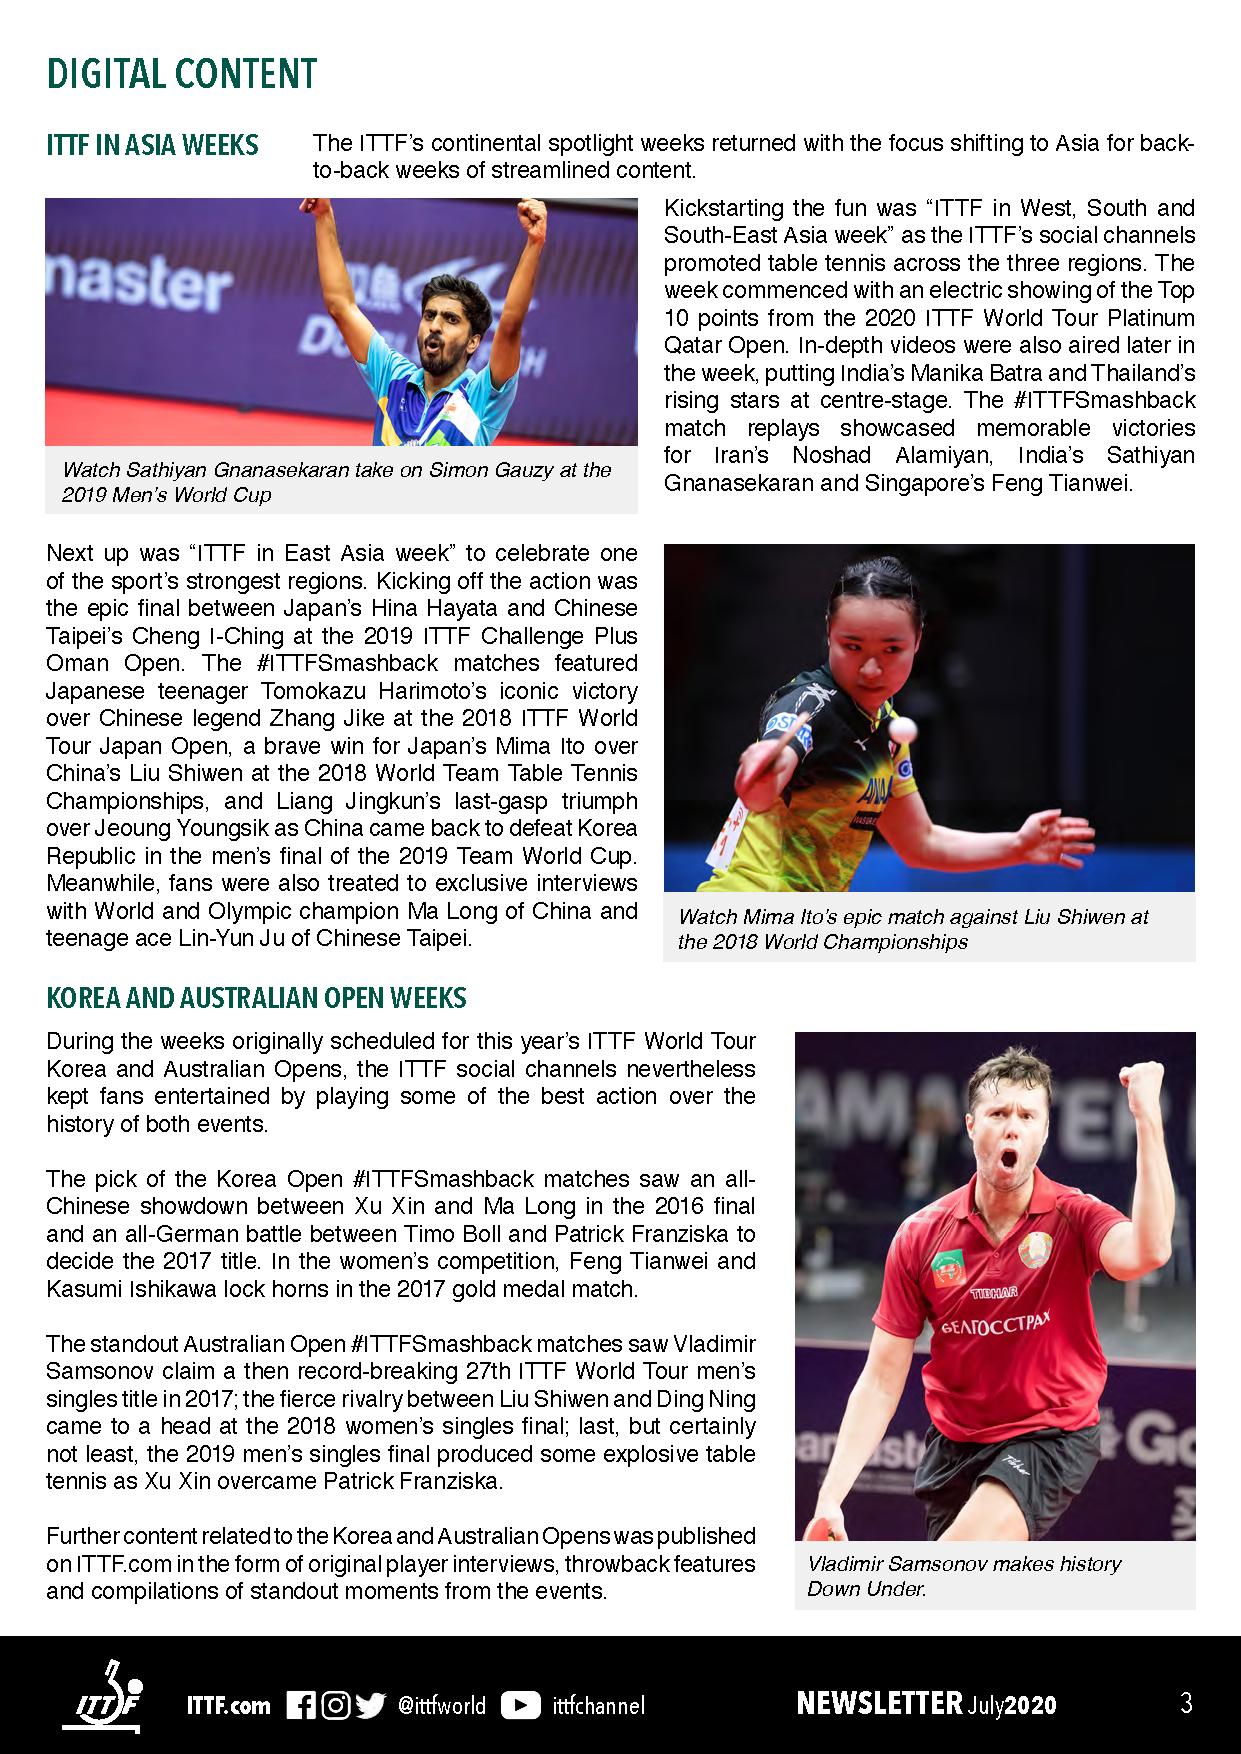 ITTF_Newsletter_05_JUL-2020_0_Page_3